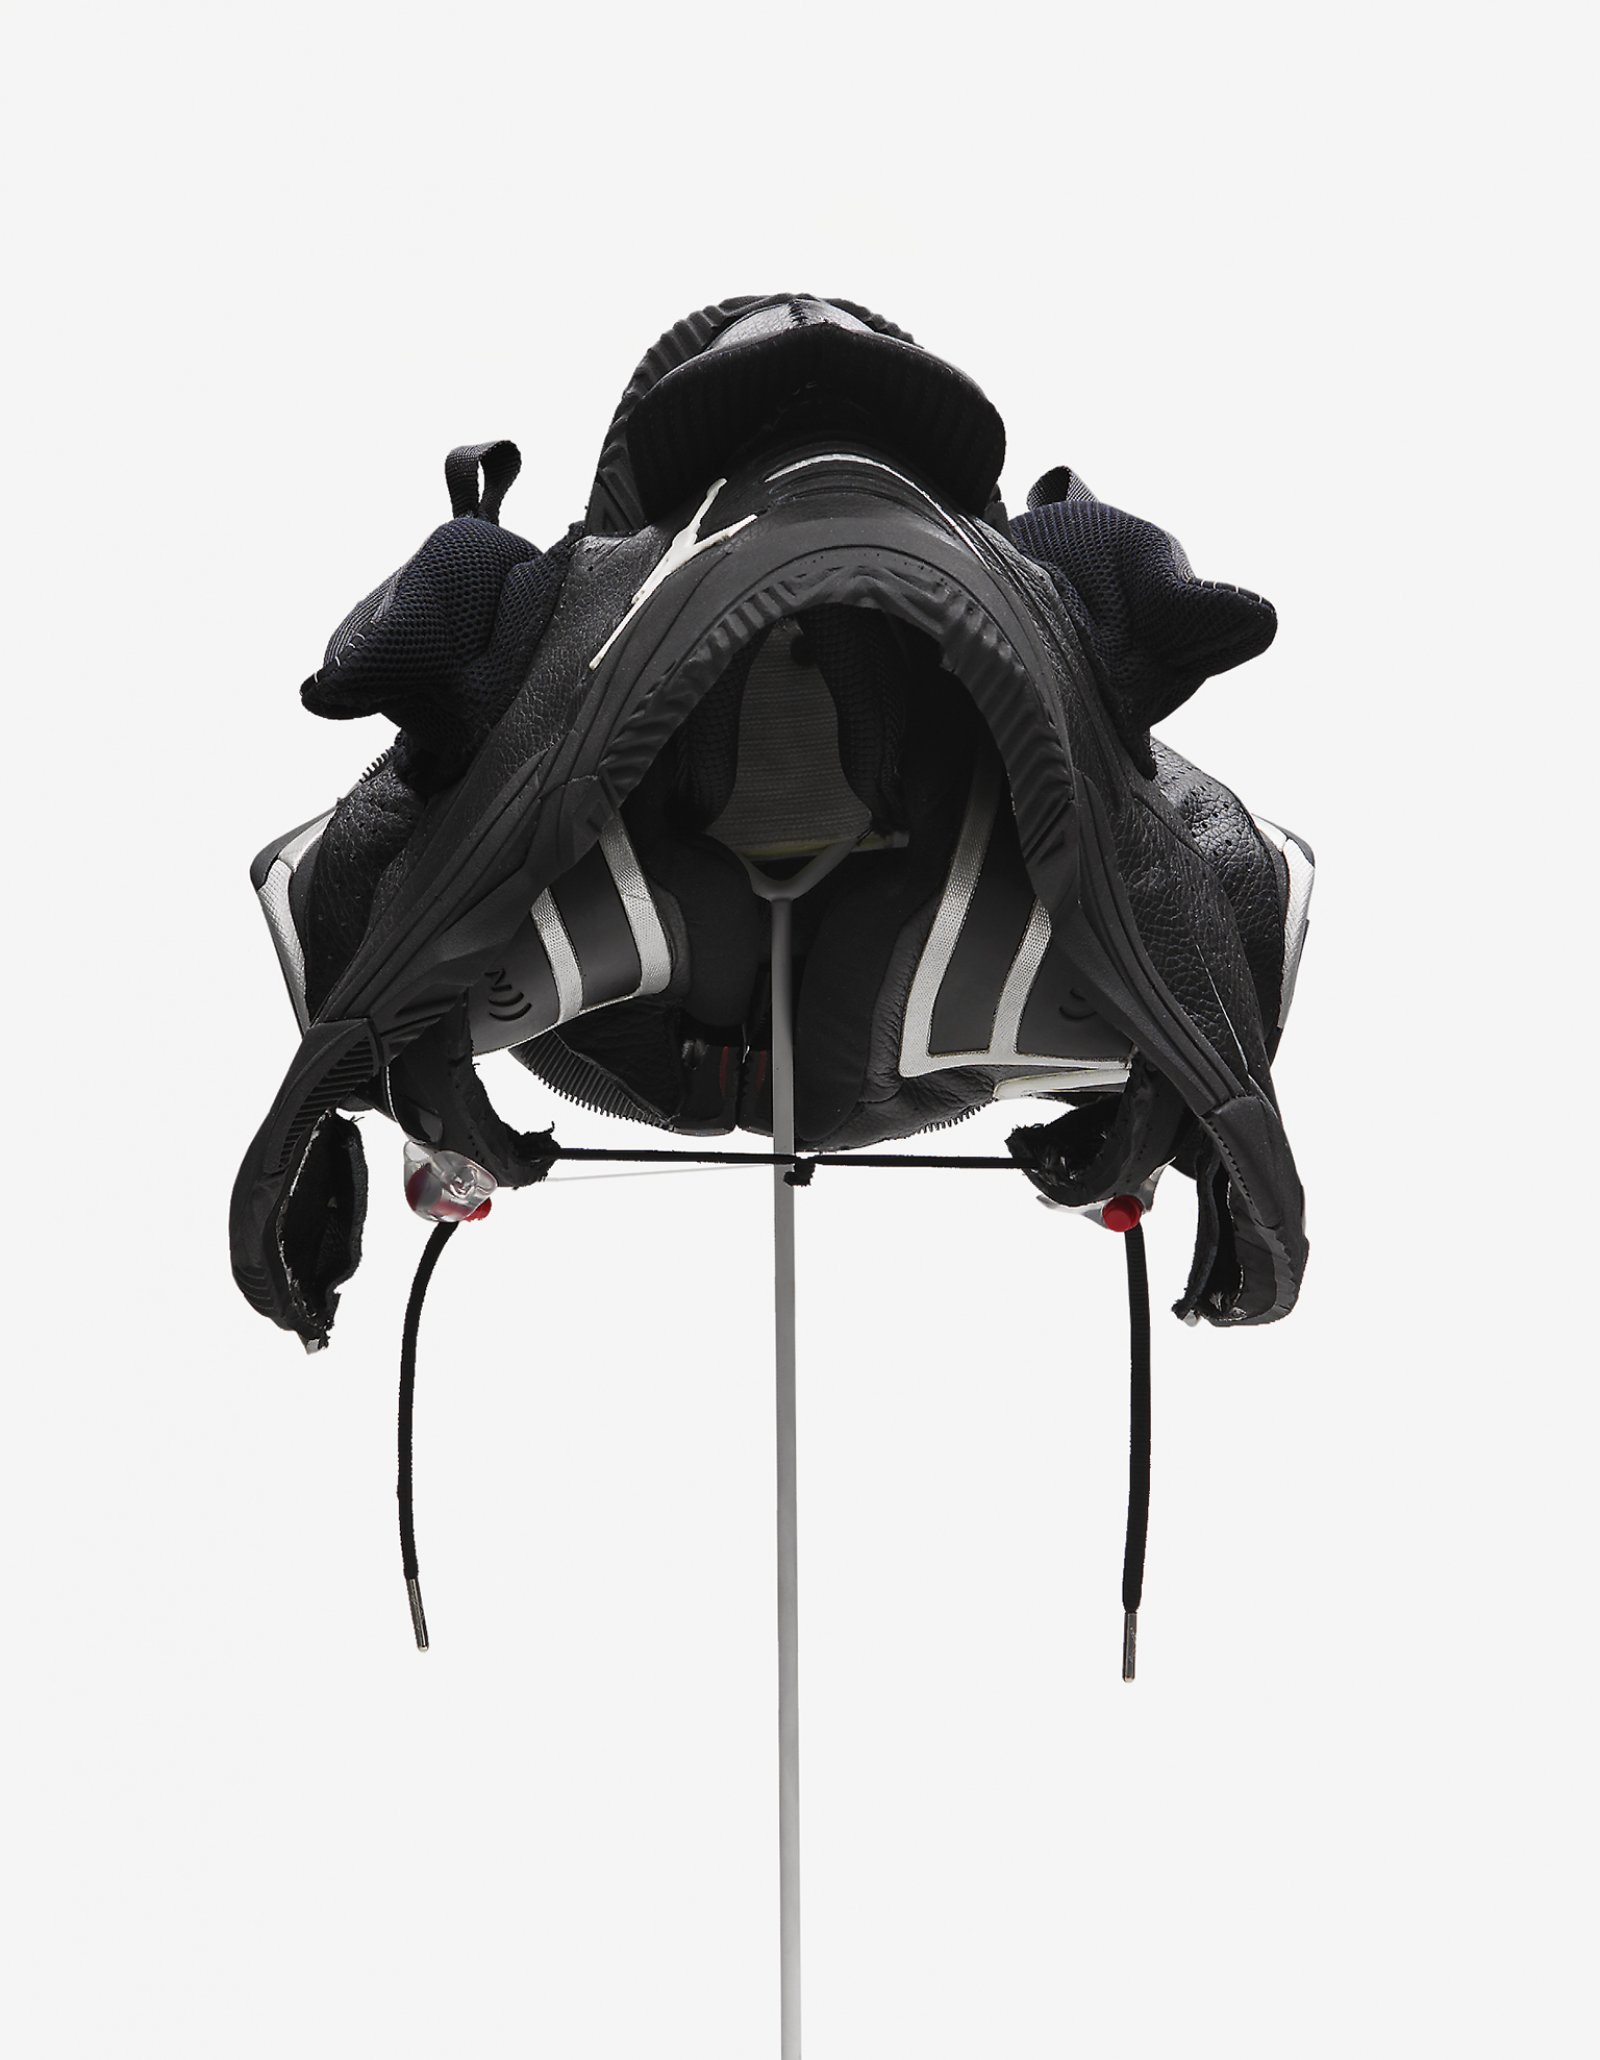 Brian Jungen,Prototype for New Understanding #10, 2001, nike air jordans, human hair, 11 x 14 x 23in. (28 x 36 x 58cm)